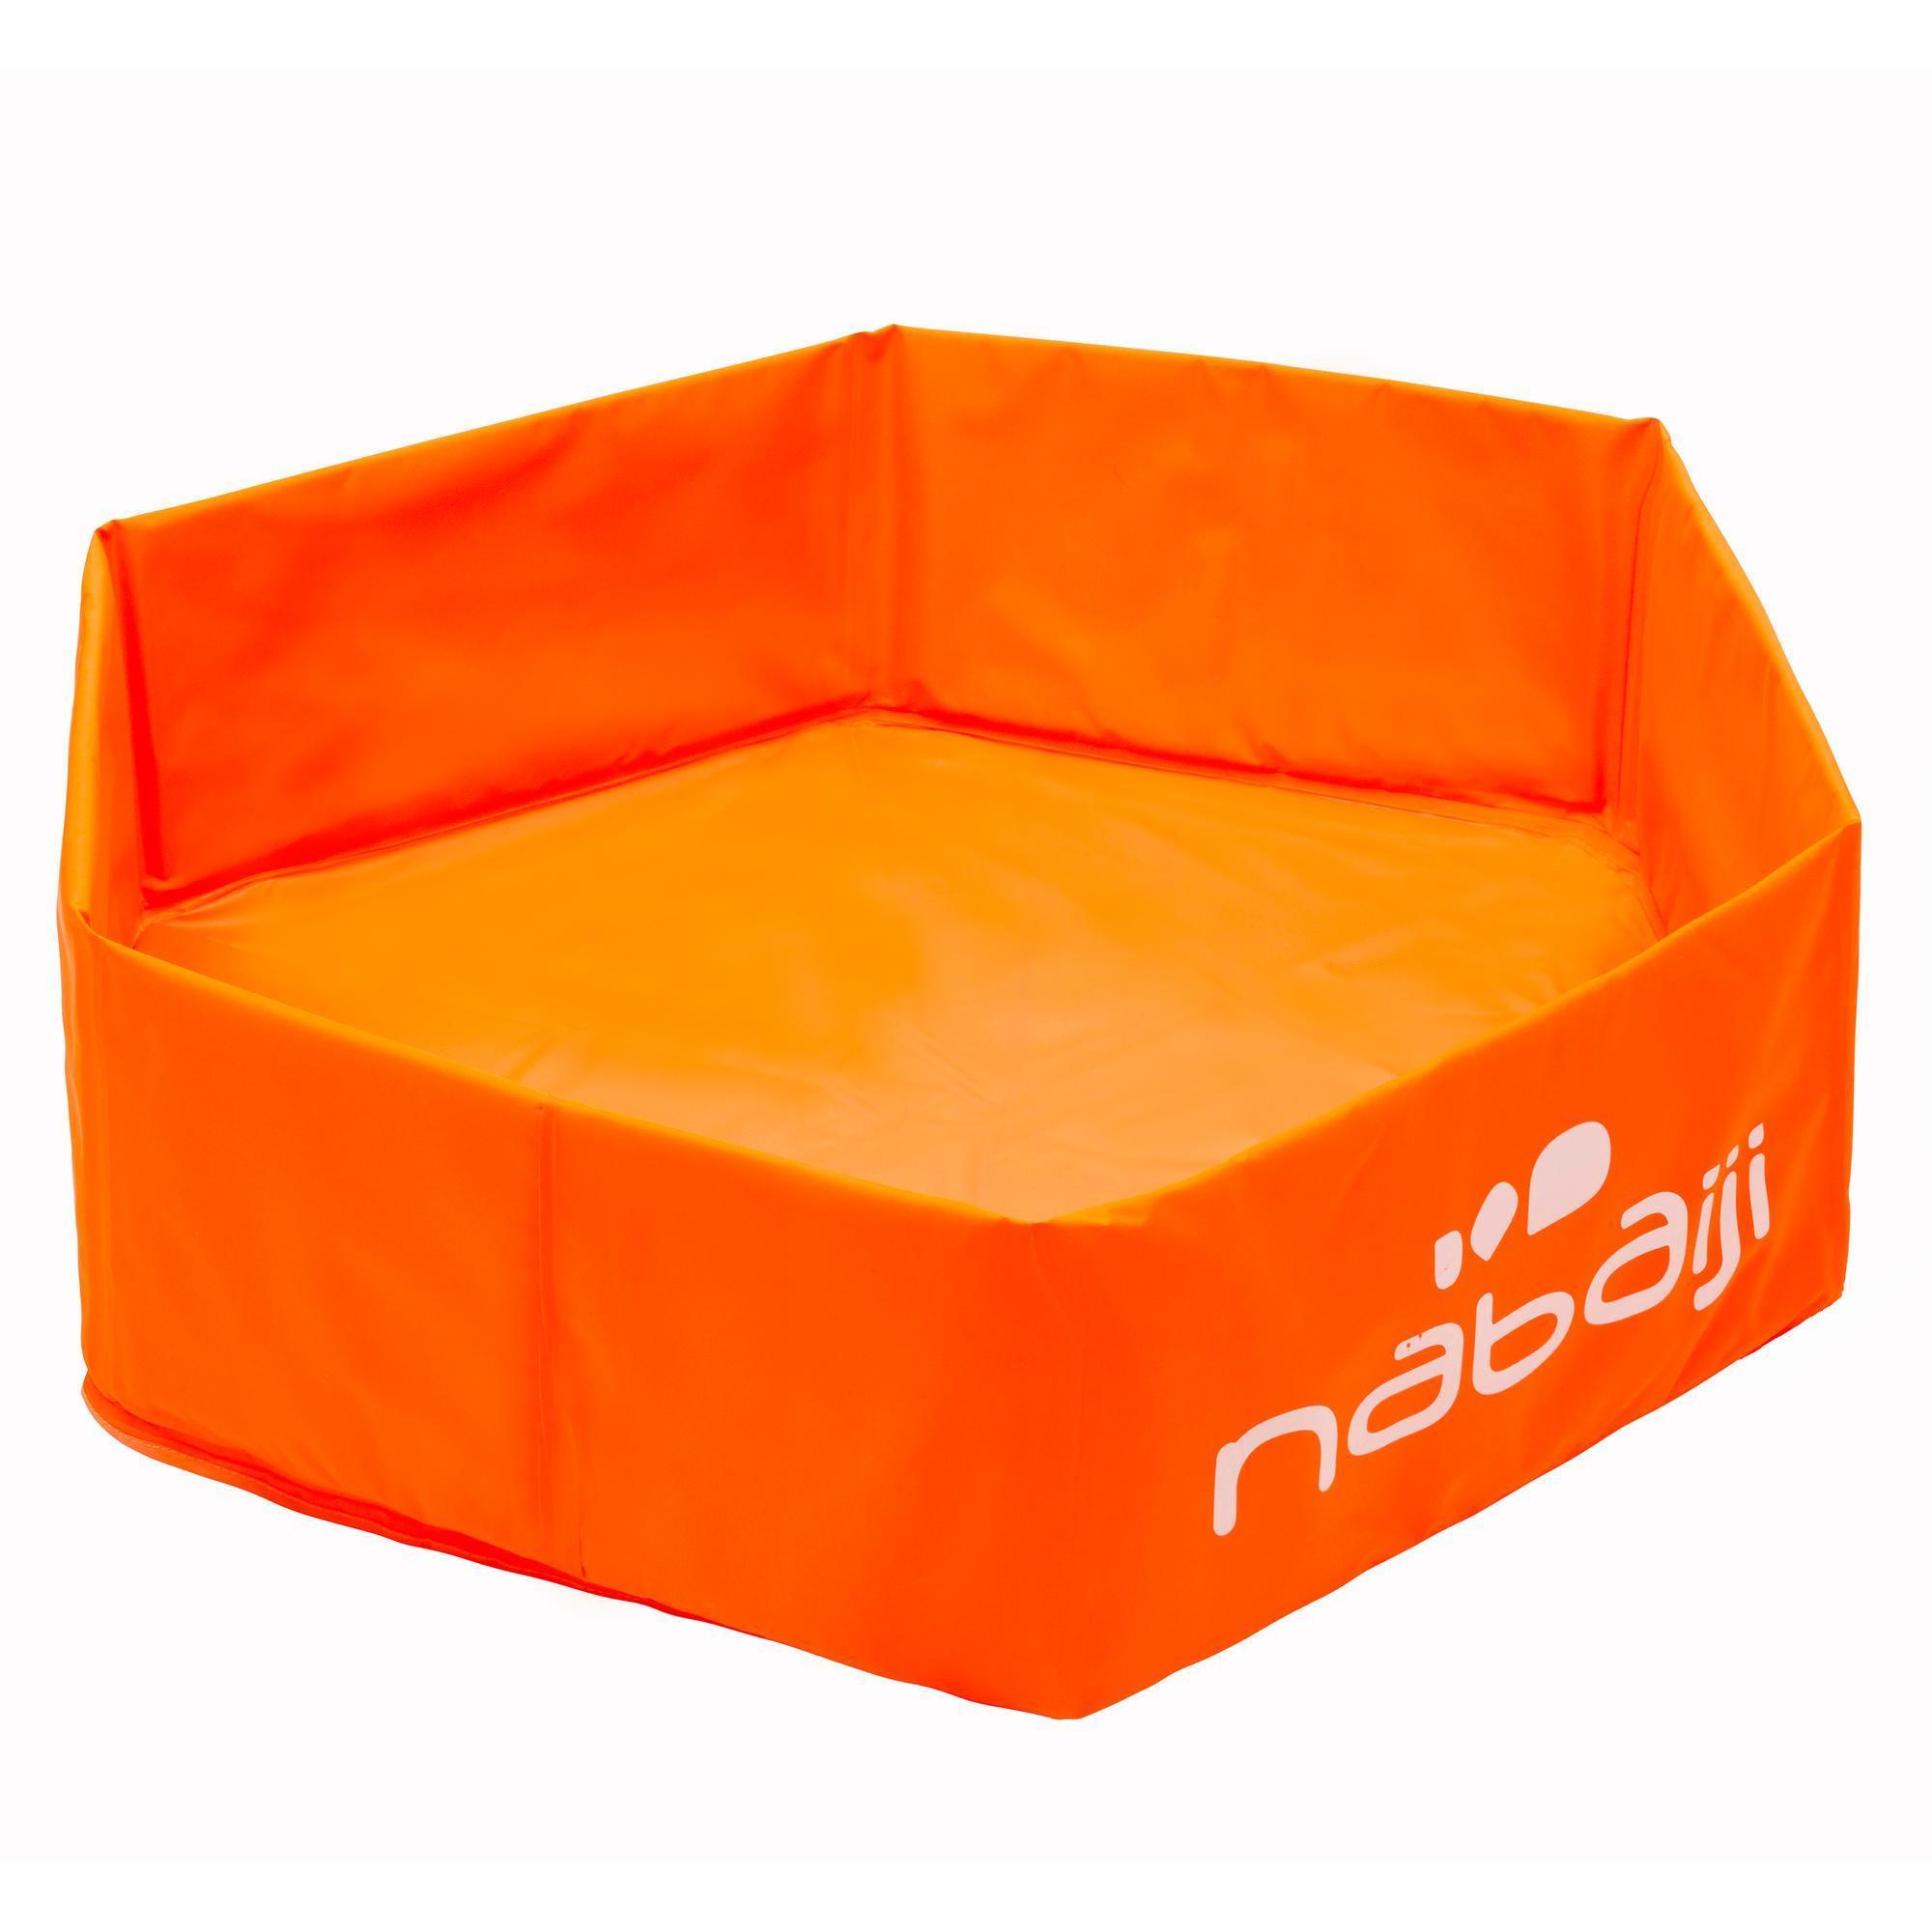 Petite Piscine Enfant Tidipool Basic Orange encequiconcerne Velo Piscine Decathlon